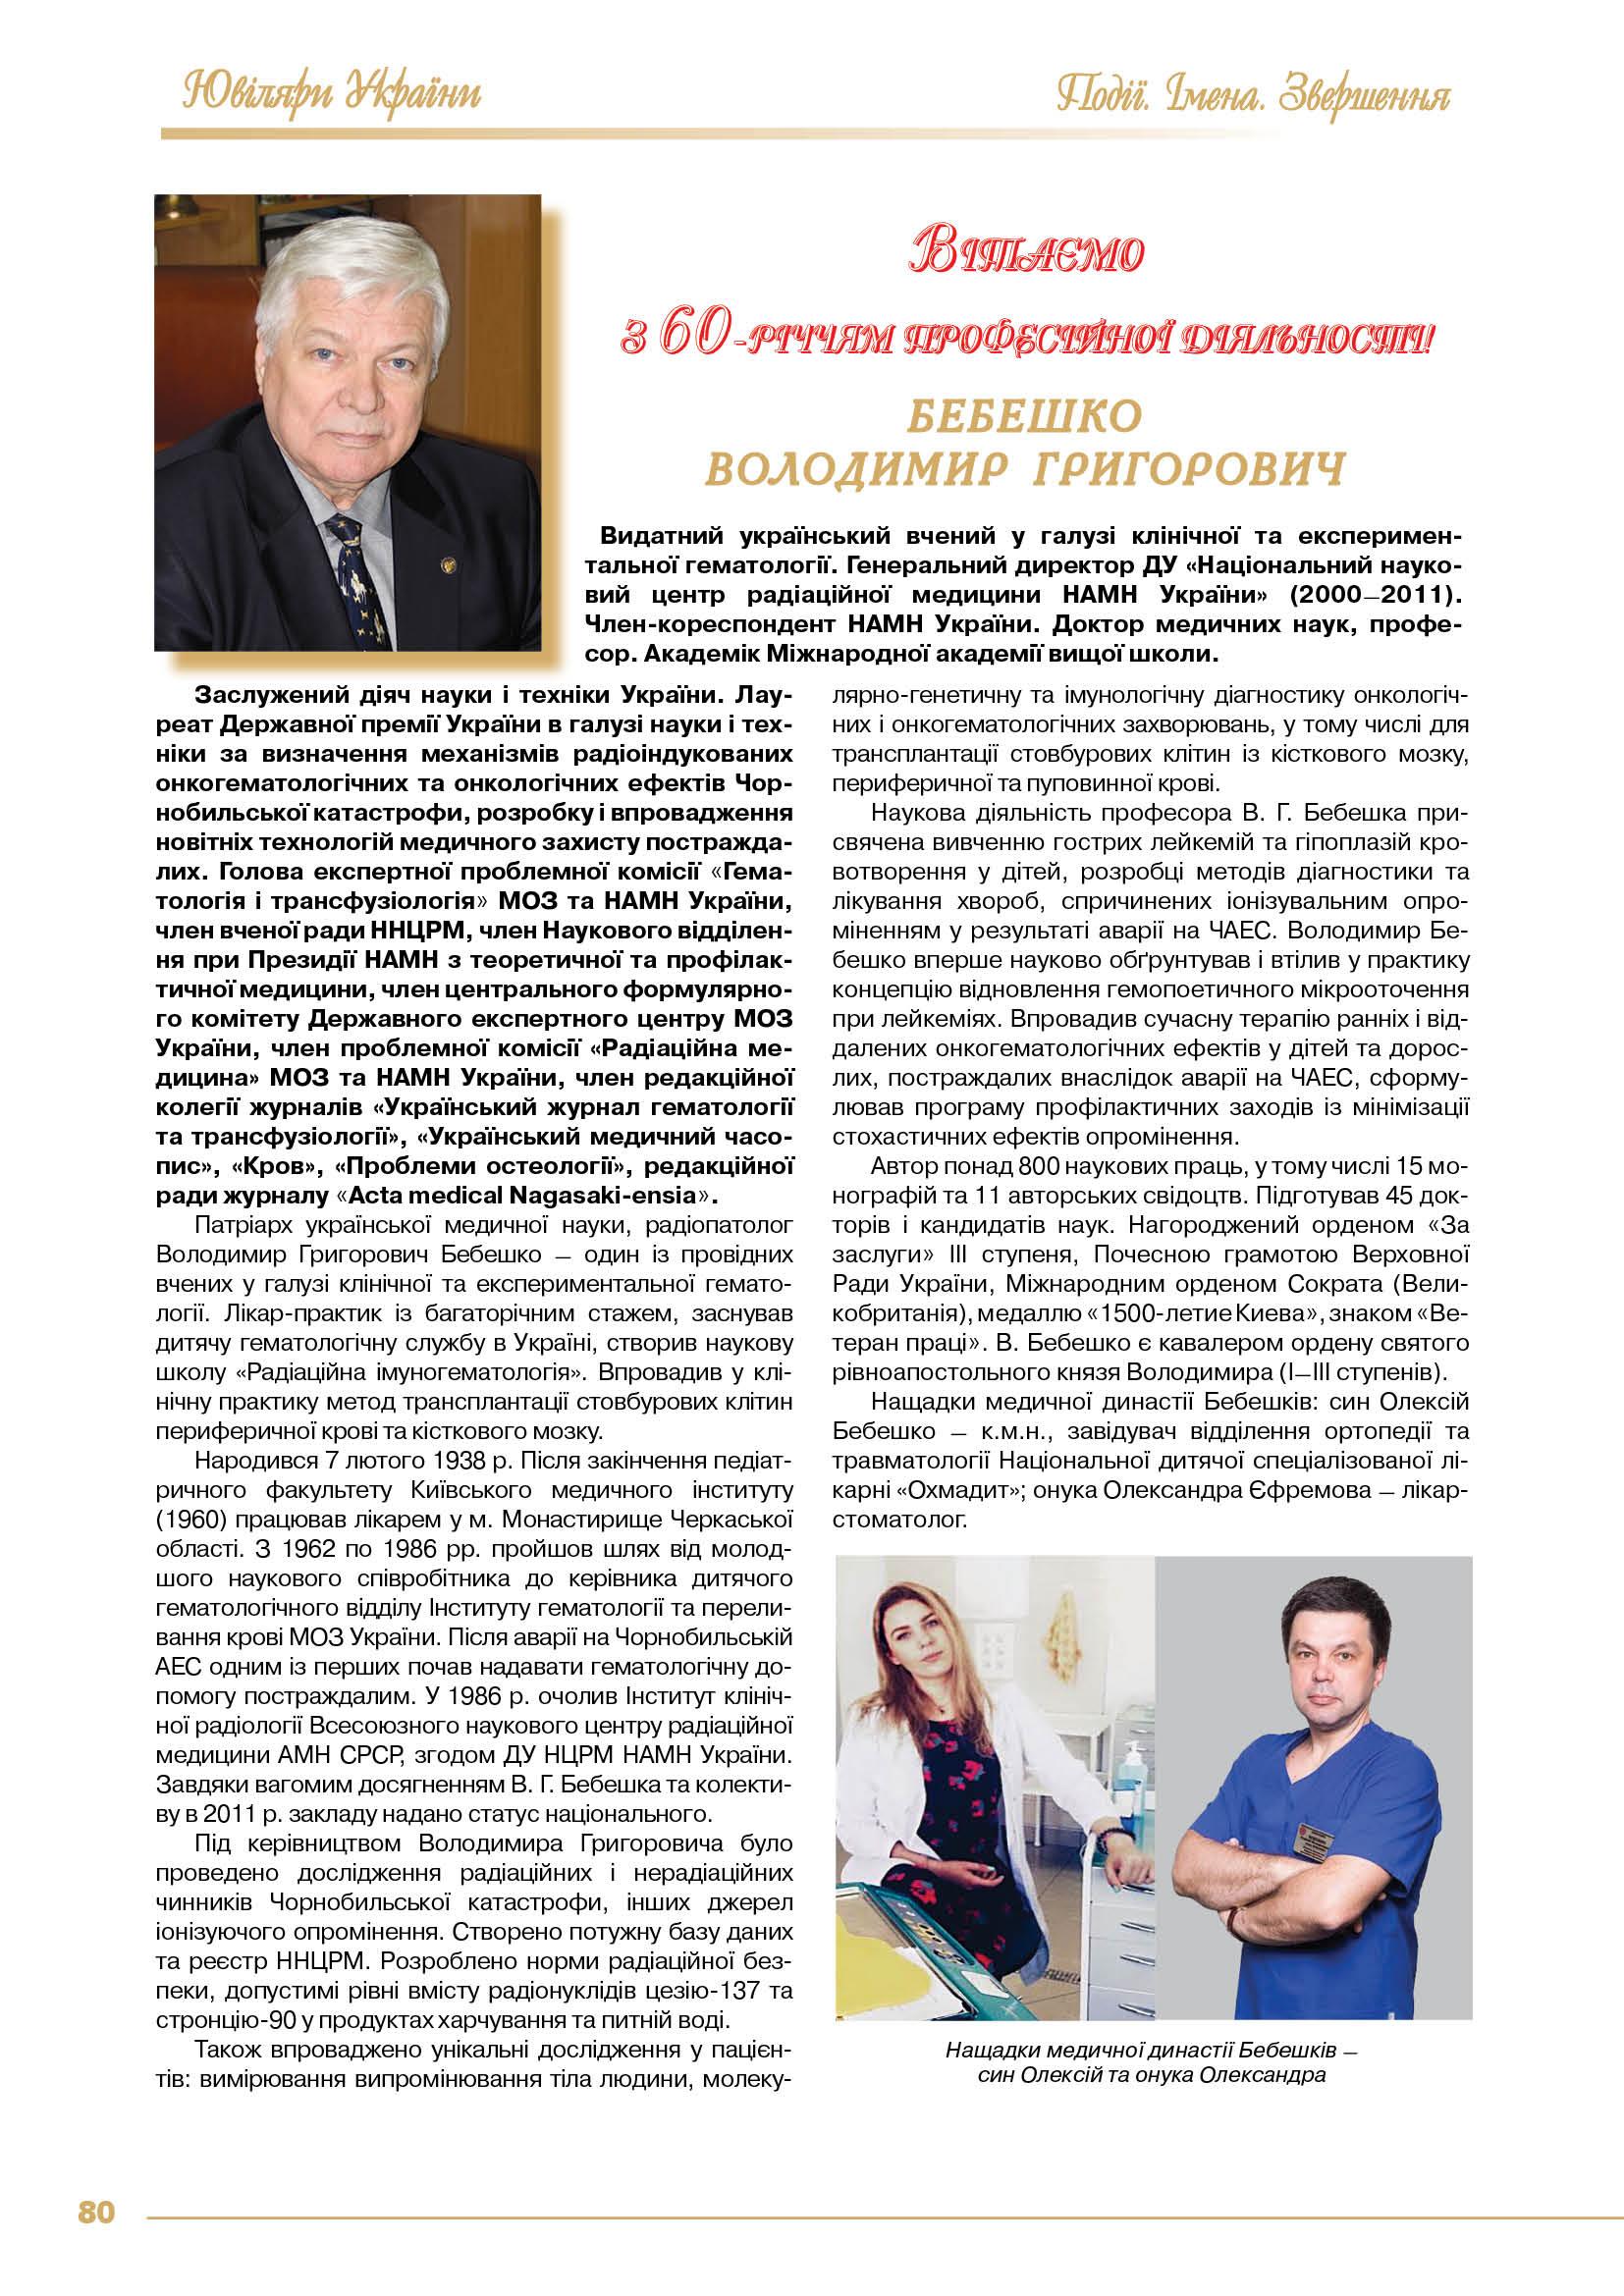 Бебешко Володимир Григорович